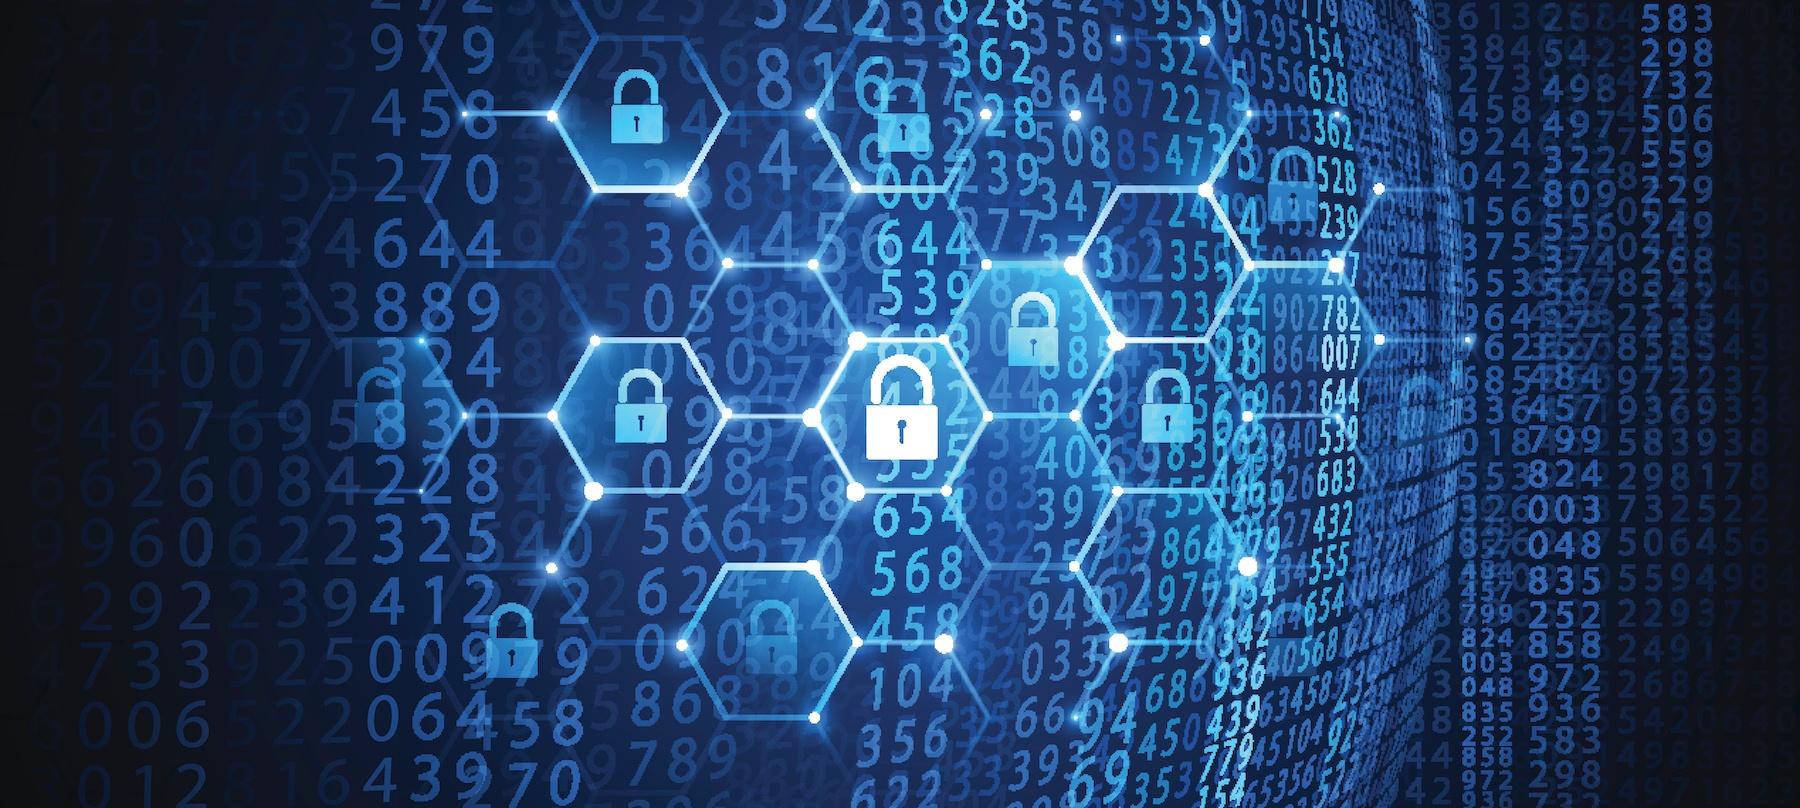 data security 2